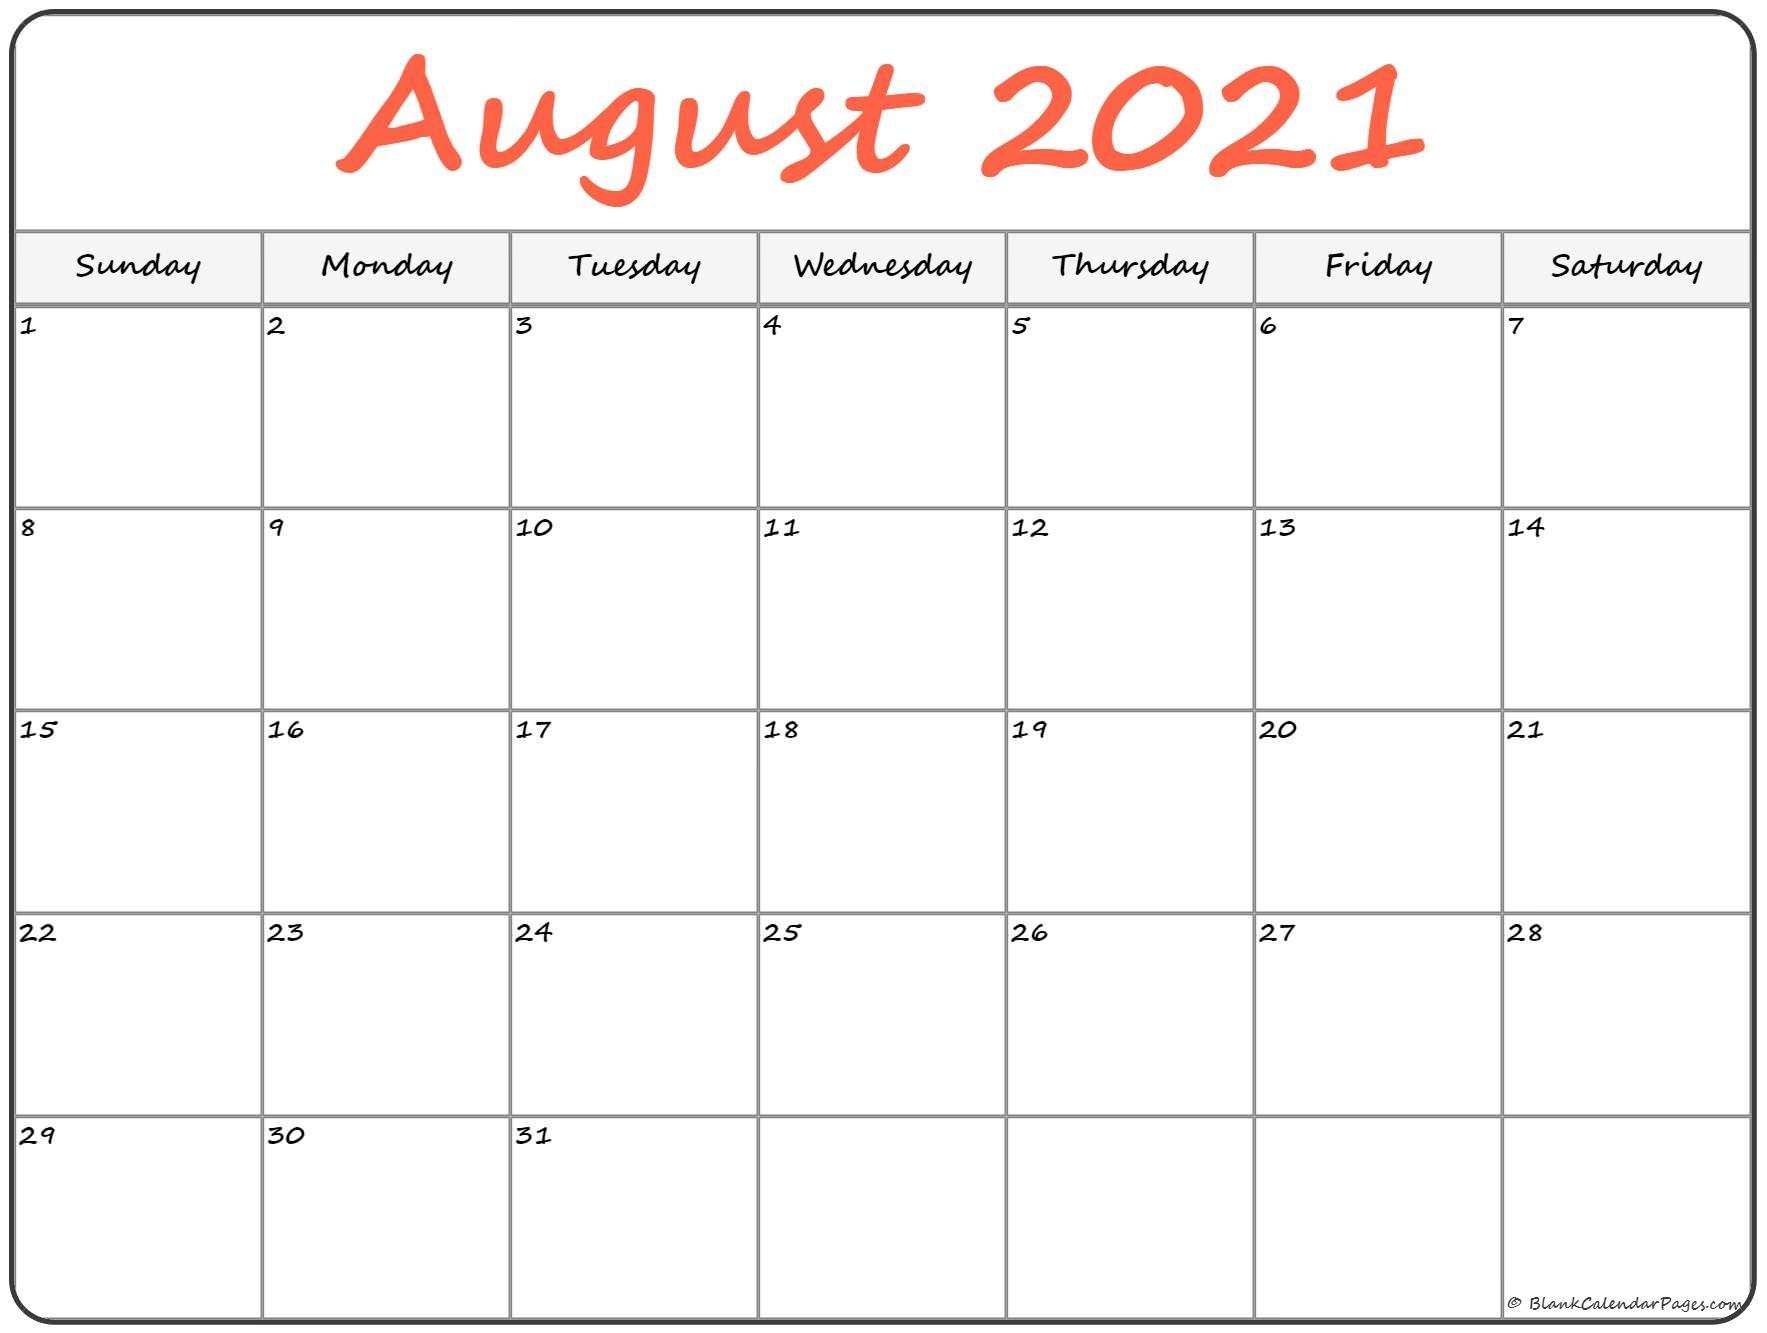 Get Leo August 2021 Calender